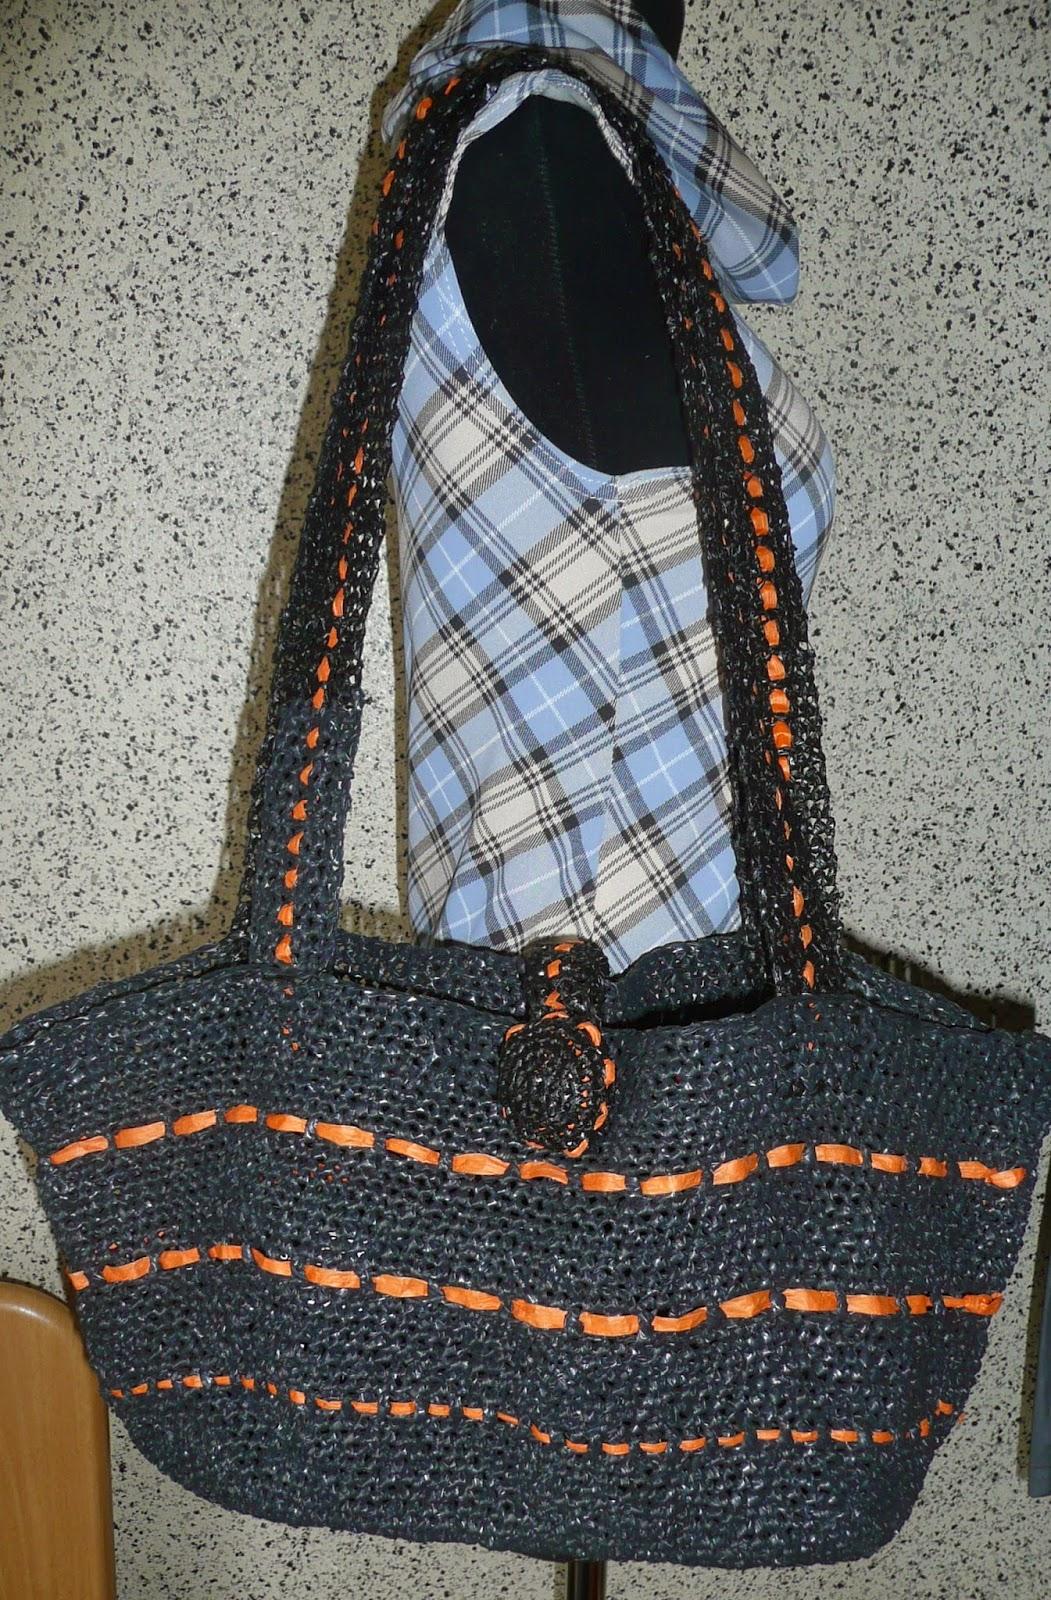 cauty bricole crochet sac recyclage sacs plastique. Black Bedroom Furniture Sets. Home Design Ideas